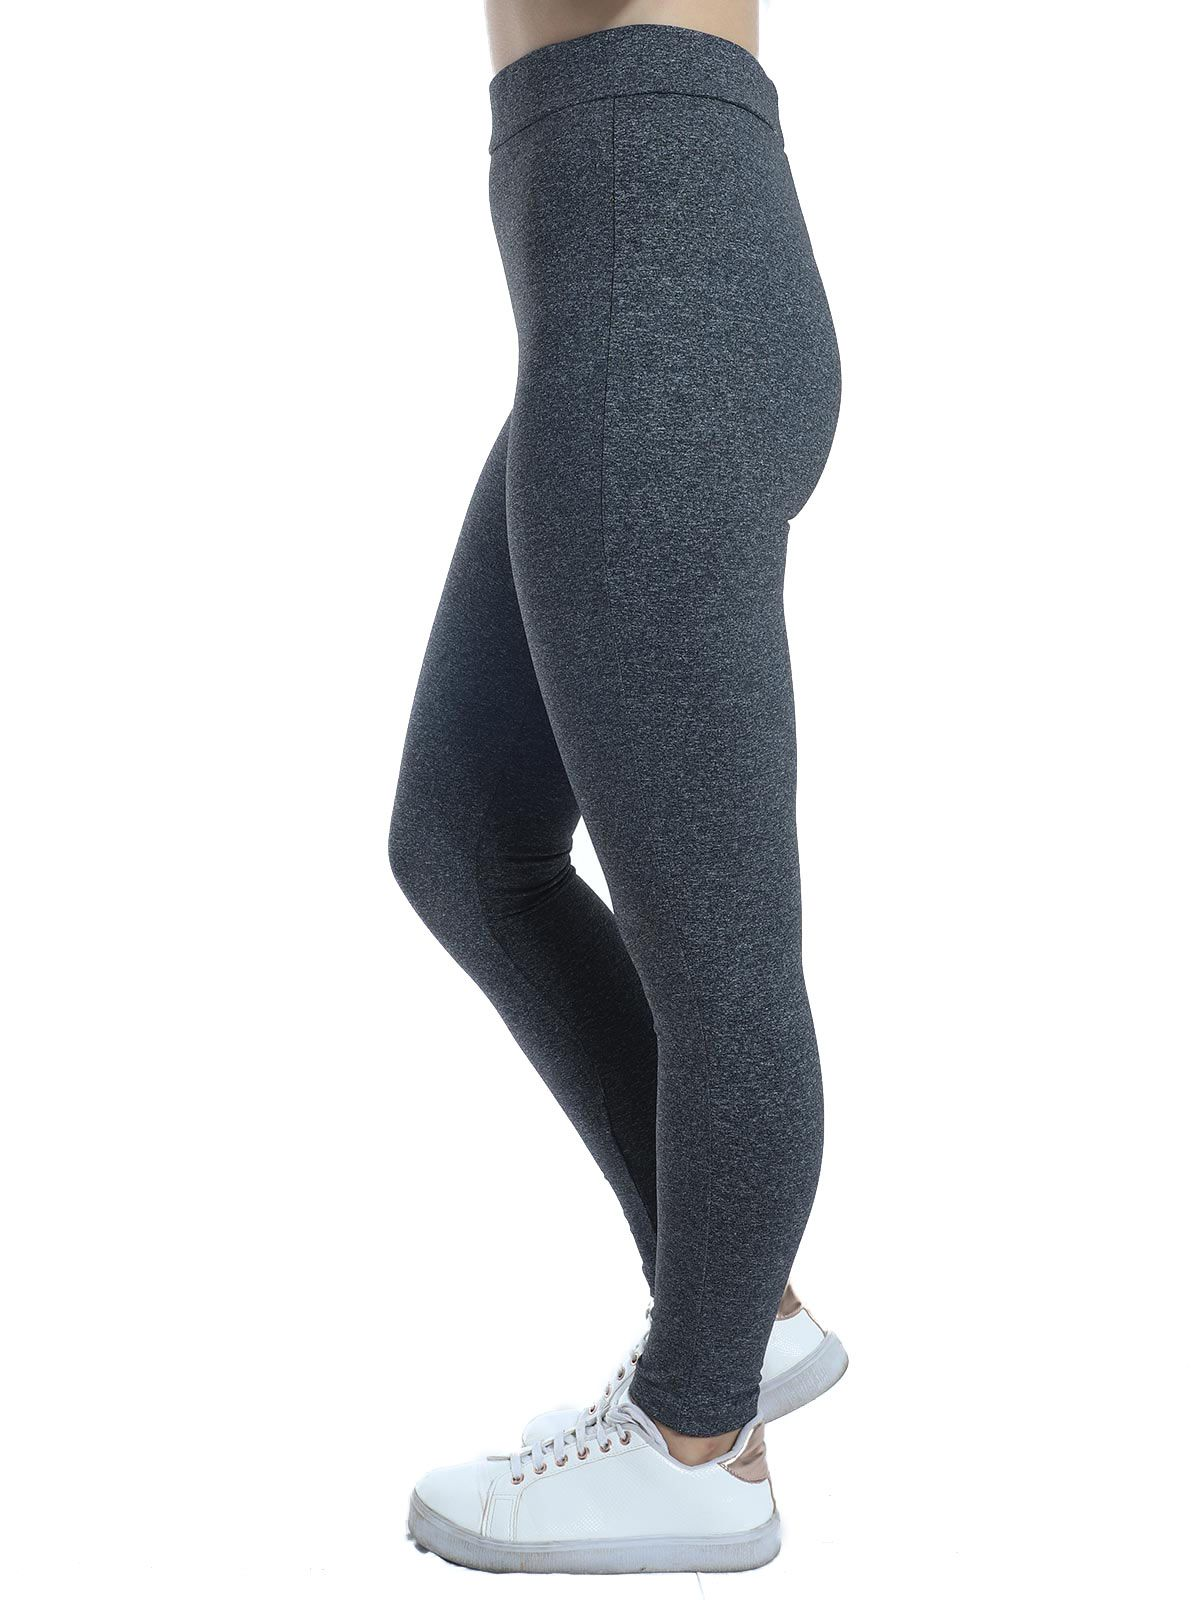 Calça Fusô Fitness Anistia Mescla Escuro